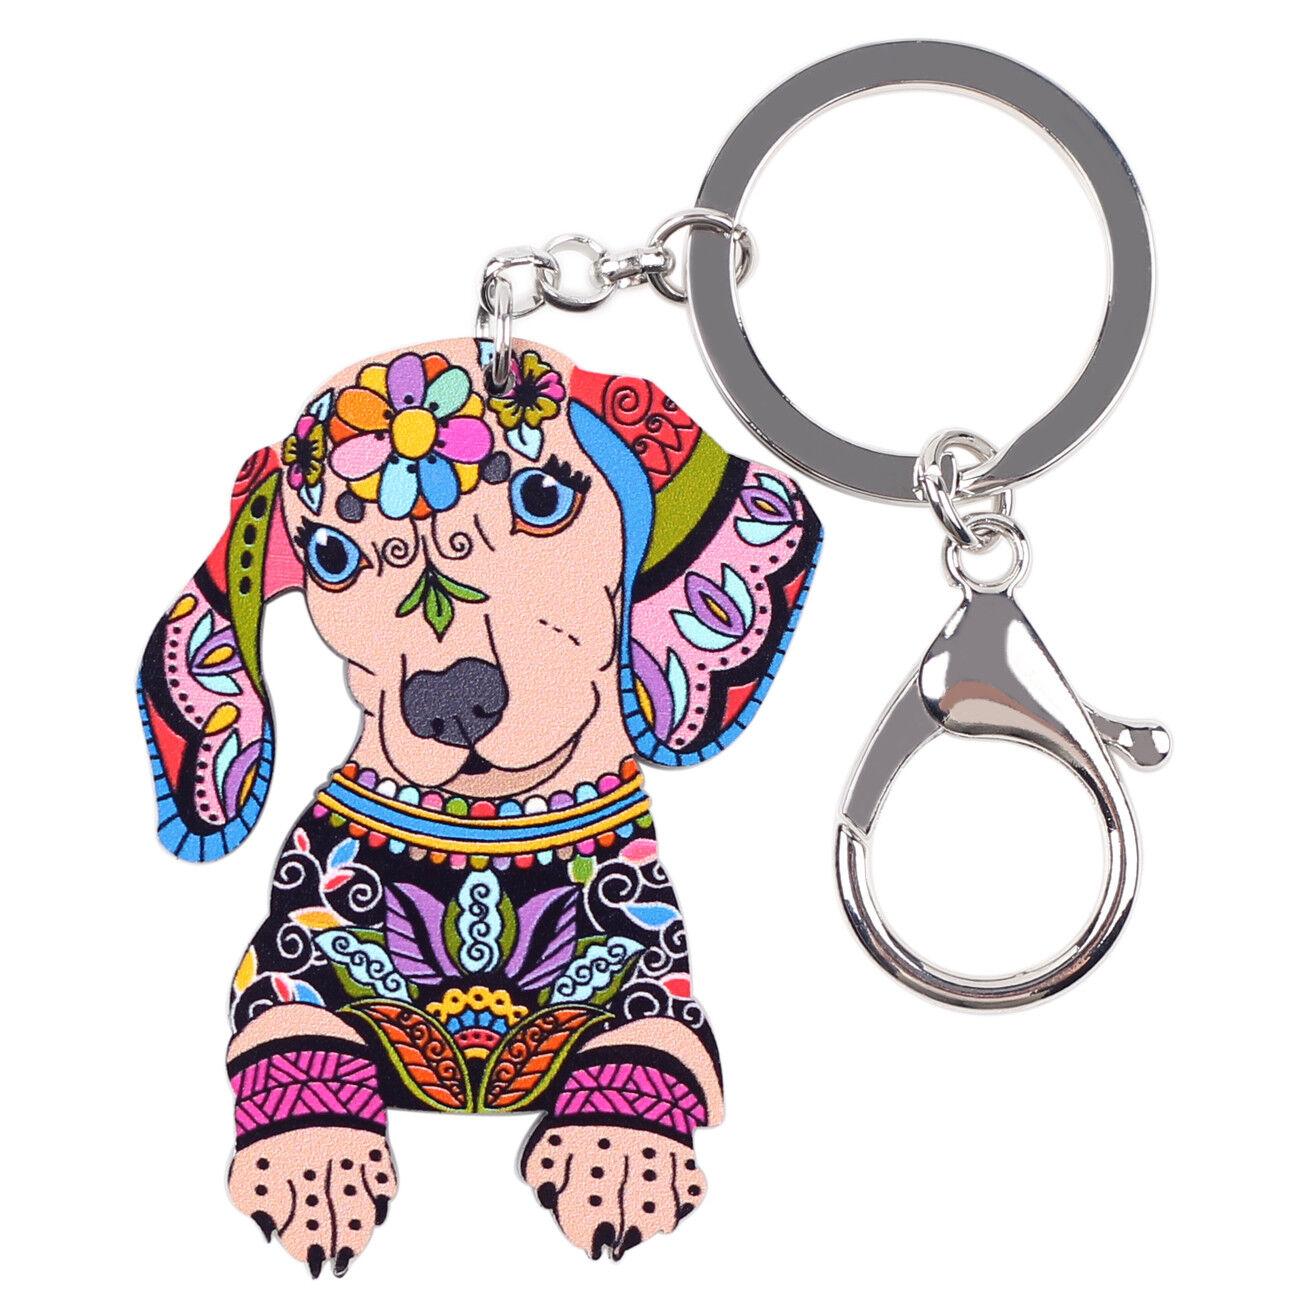 Acrylic Dachshund Dog Keychain Ring For Girls Teens Wallet C